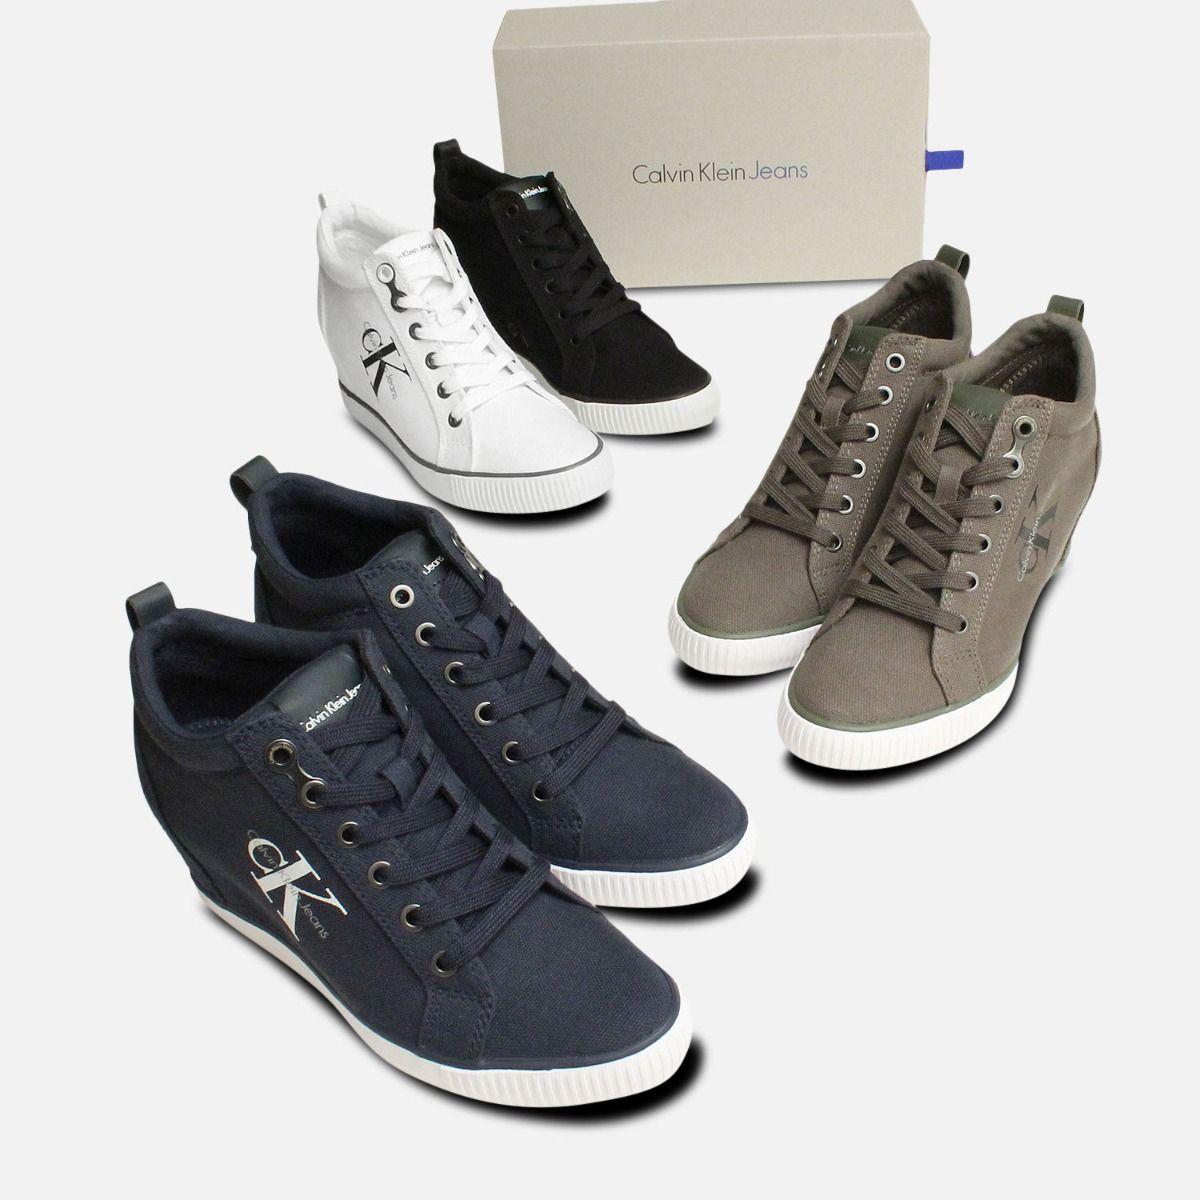 Black Canvas Ritzy Heel Sneakers by